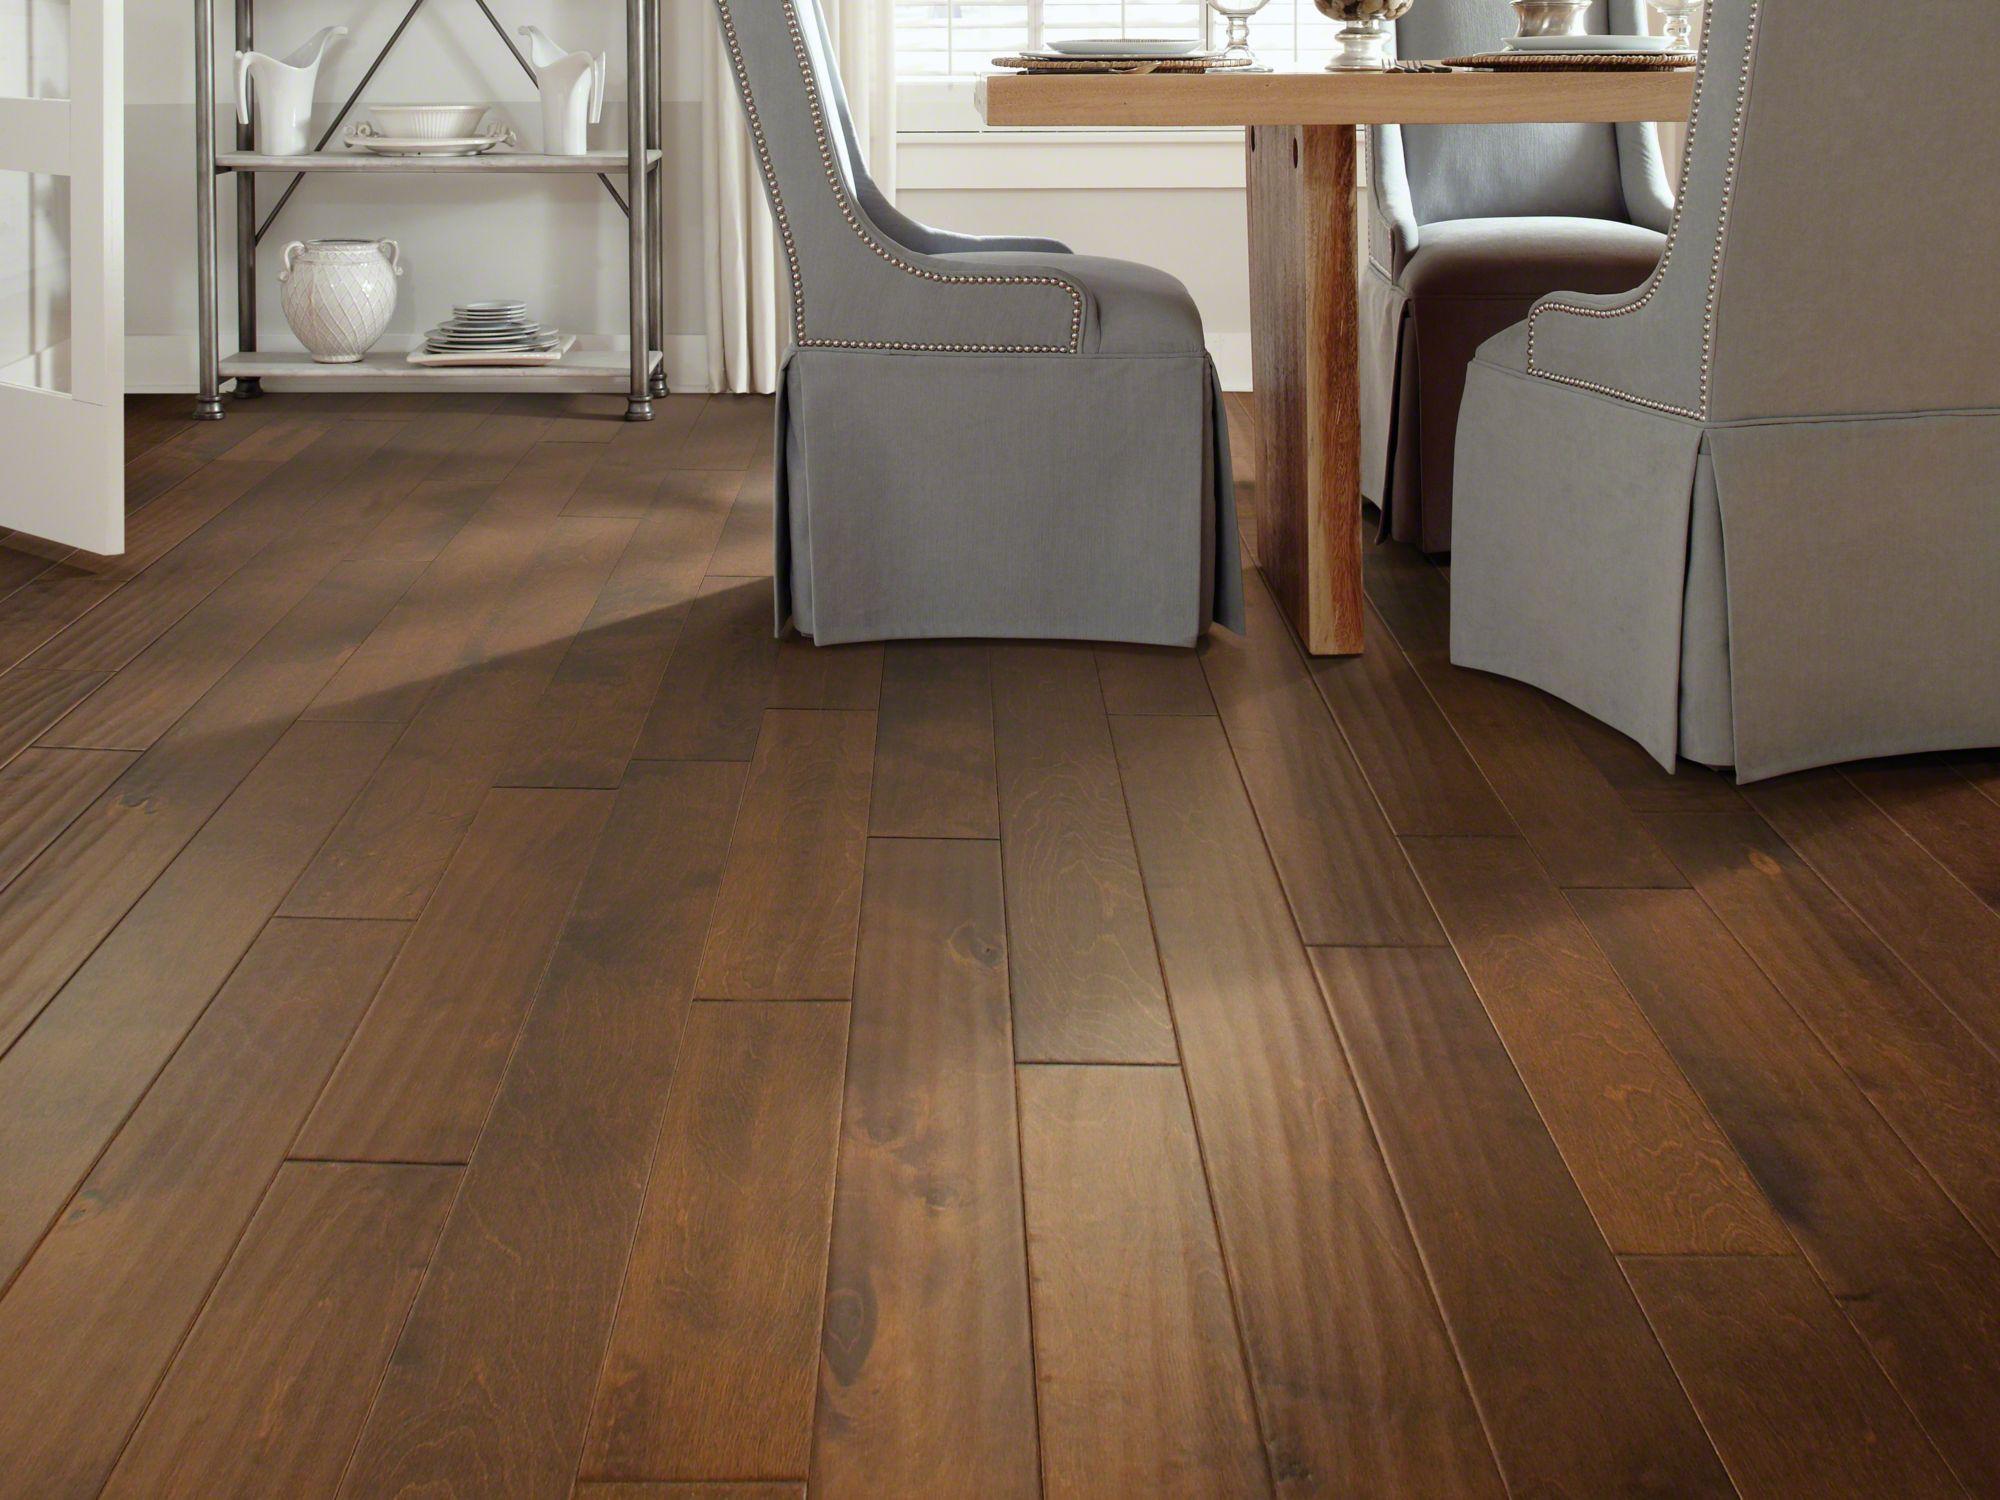 shaw wood flooring st petersburg sa427 - surfside hardwood flooring, wood floors | shaw floors MIVCFDY